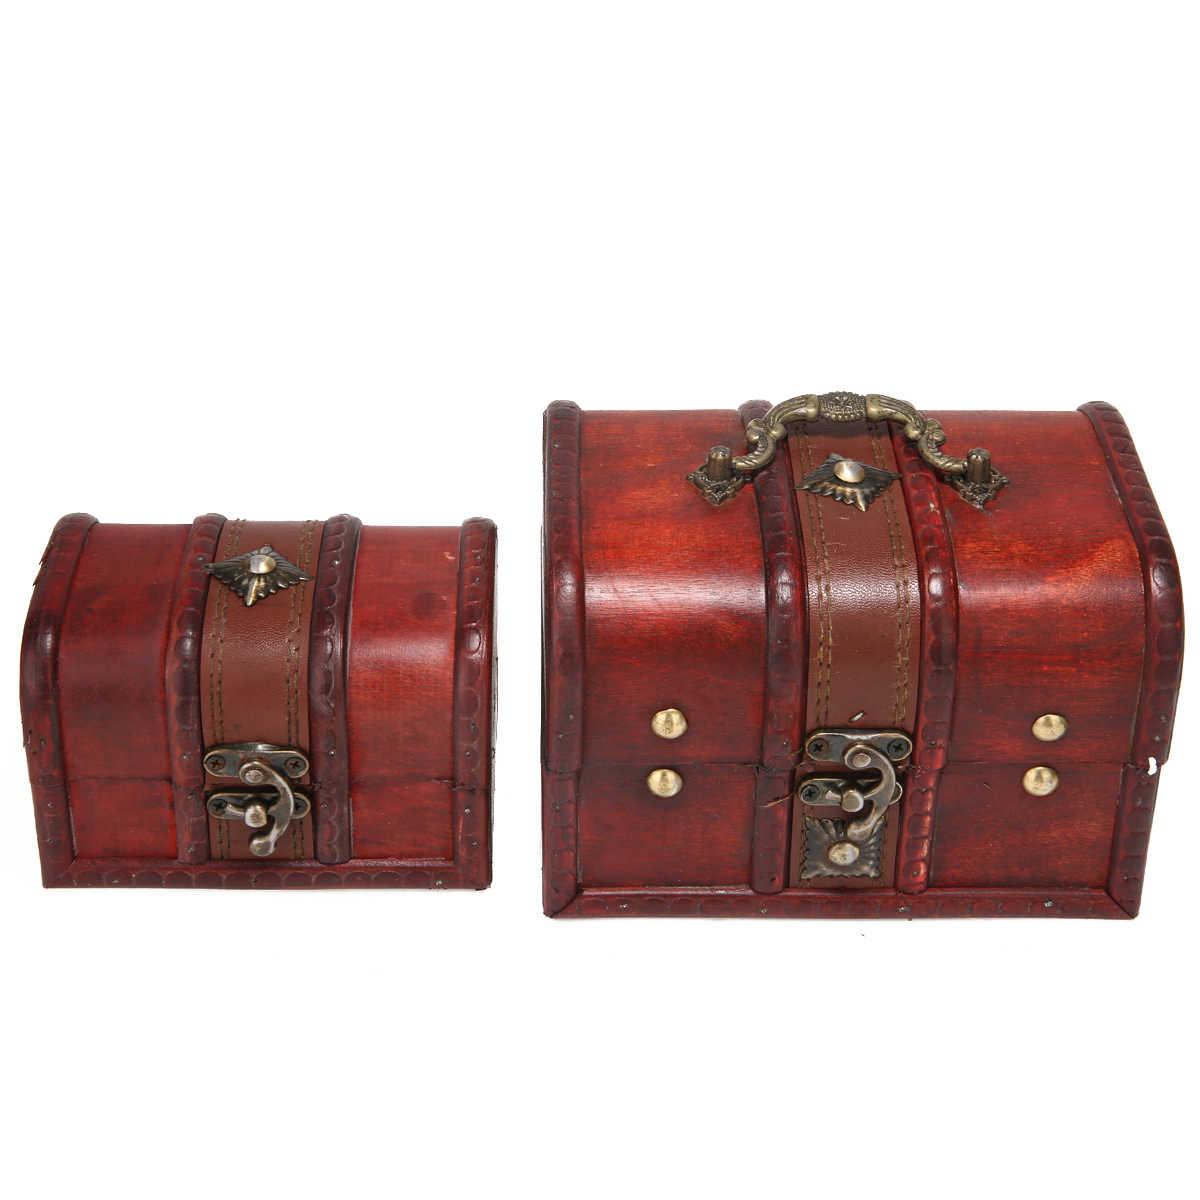 Retro Wooden Jewelry Mini Box Storage Lock Treasure Chest Wood Crate Case Holder